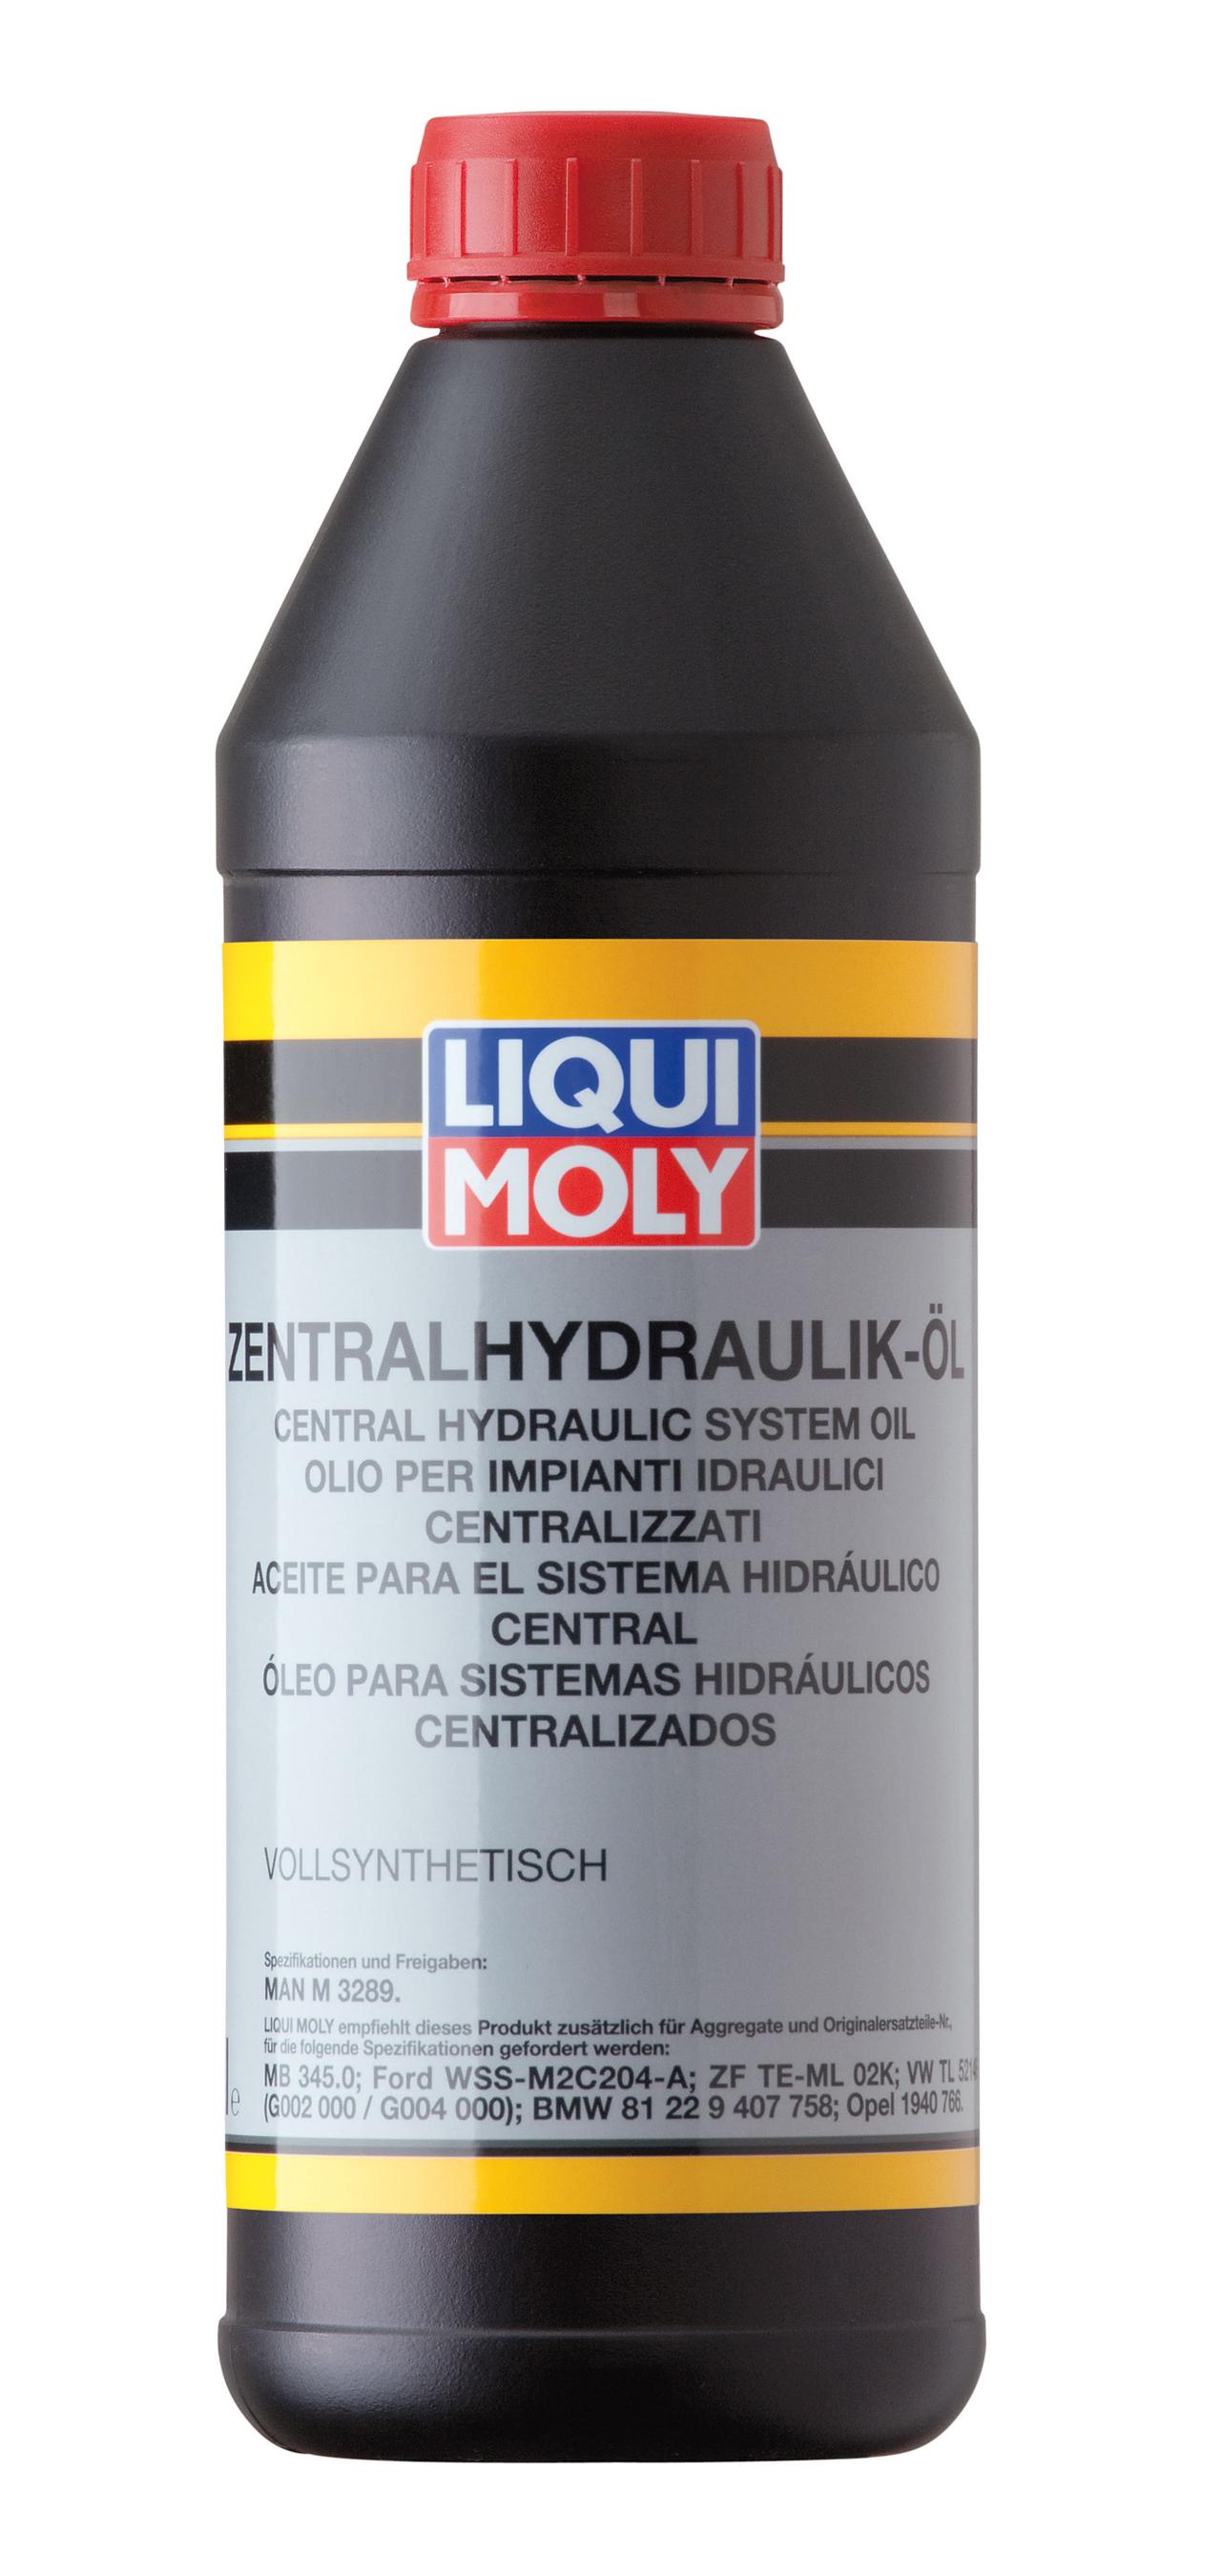 Liqui Moly Zentralhydraulik-Öl 1 Liter Bild 1